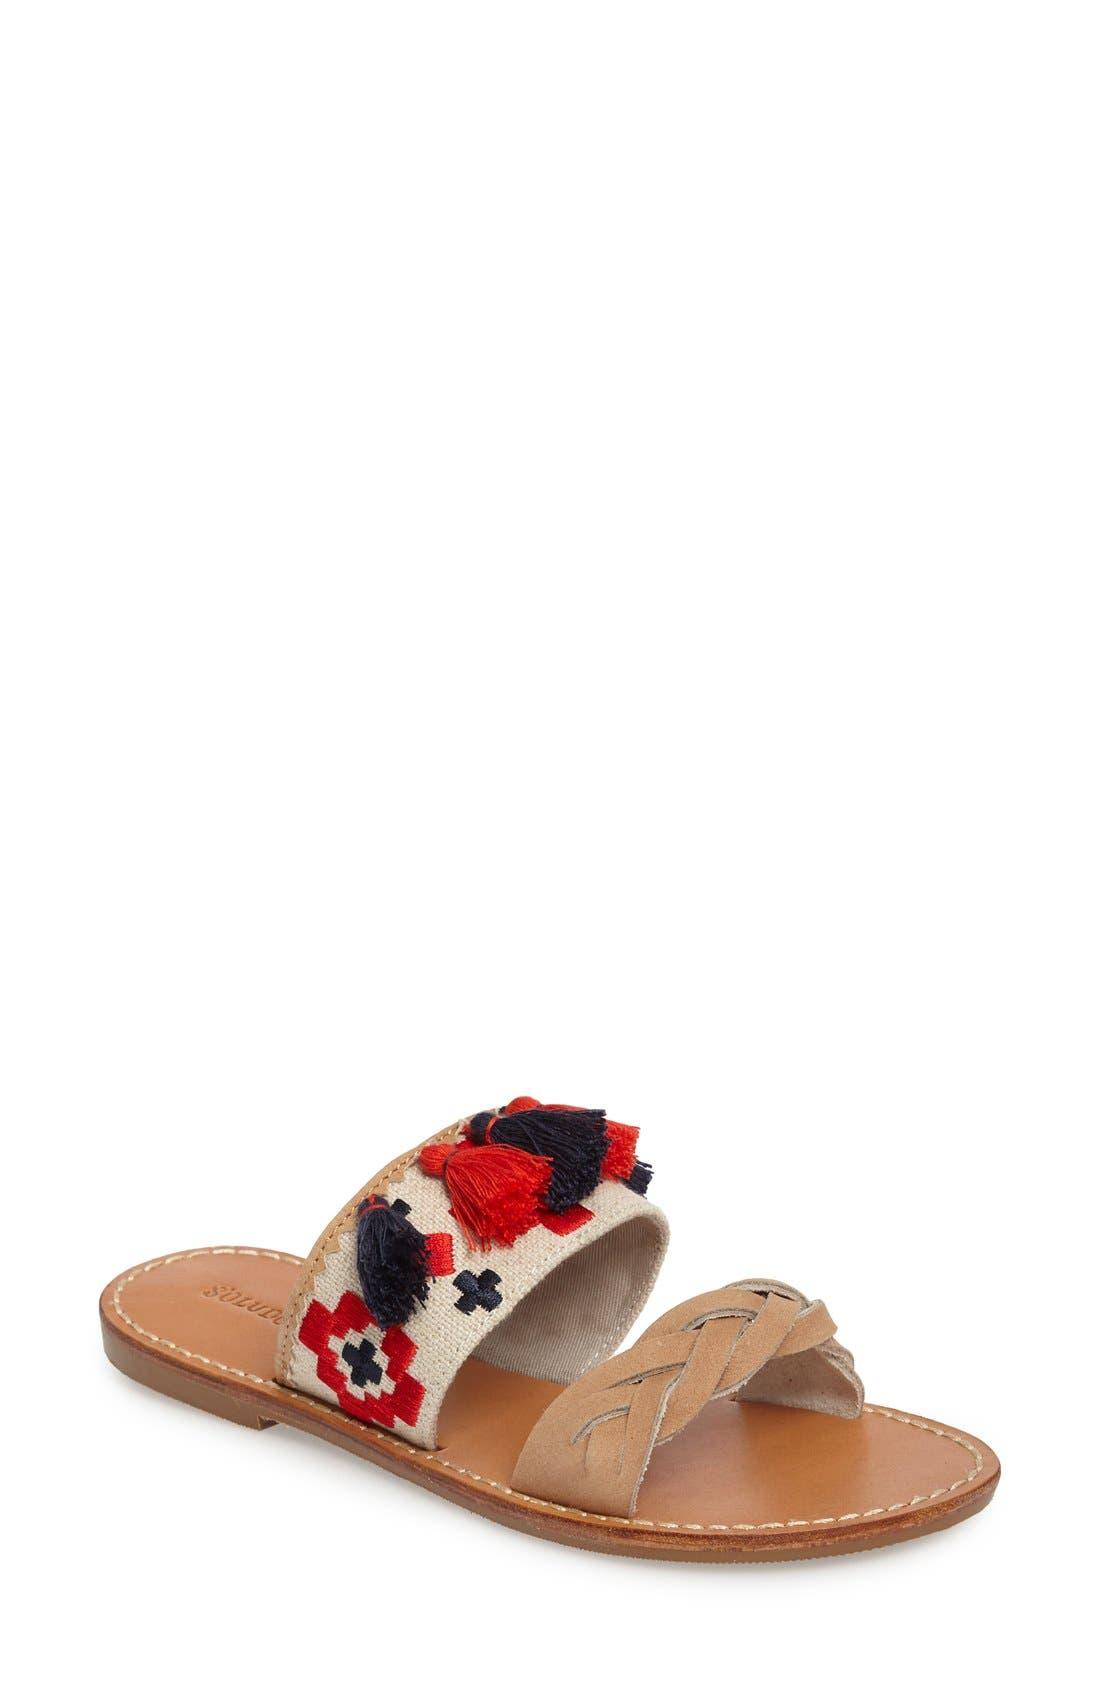 Main Image - Soludus Embroidered Slide Sandal (Women)